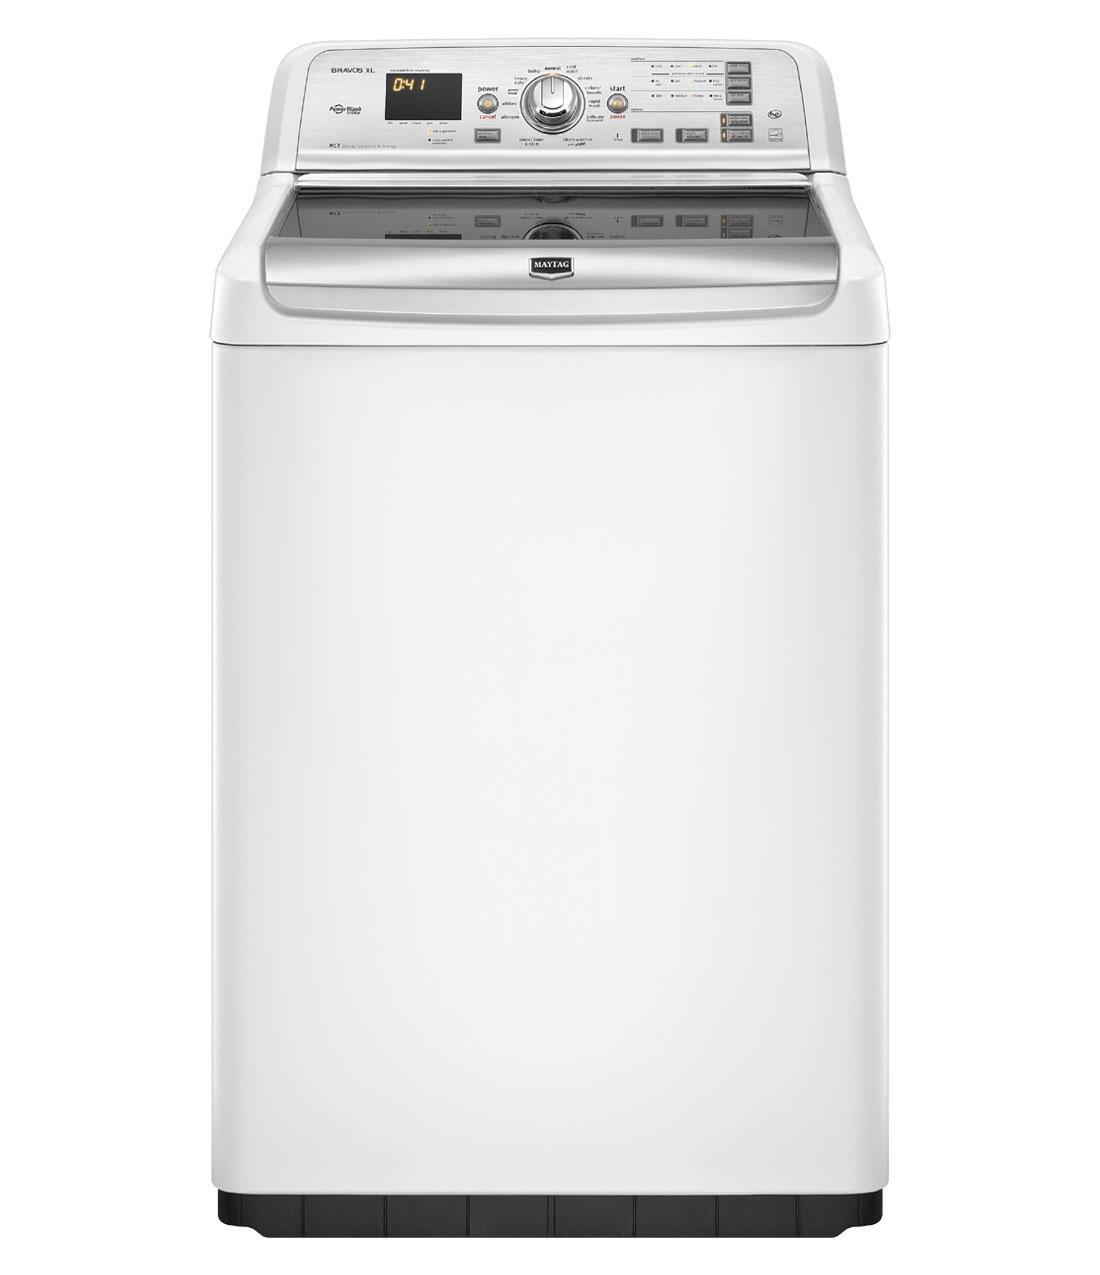 Mvwb850yg maytag mvwb850yg bravos series top load washers - Maytag whirlpool ...